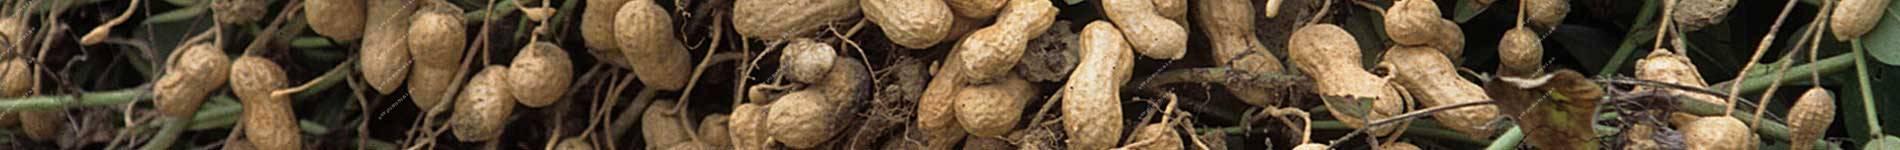 Peanut Planter and Harvester